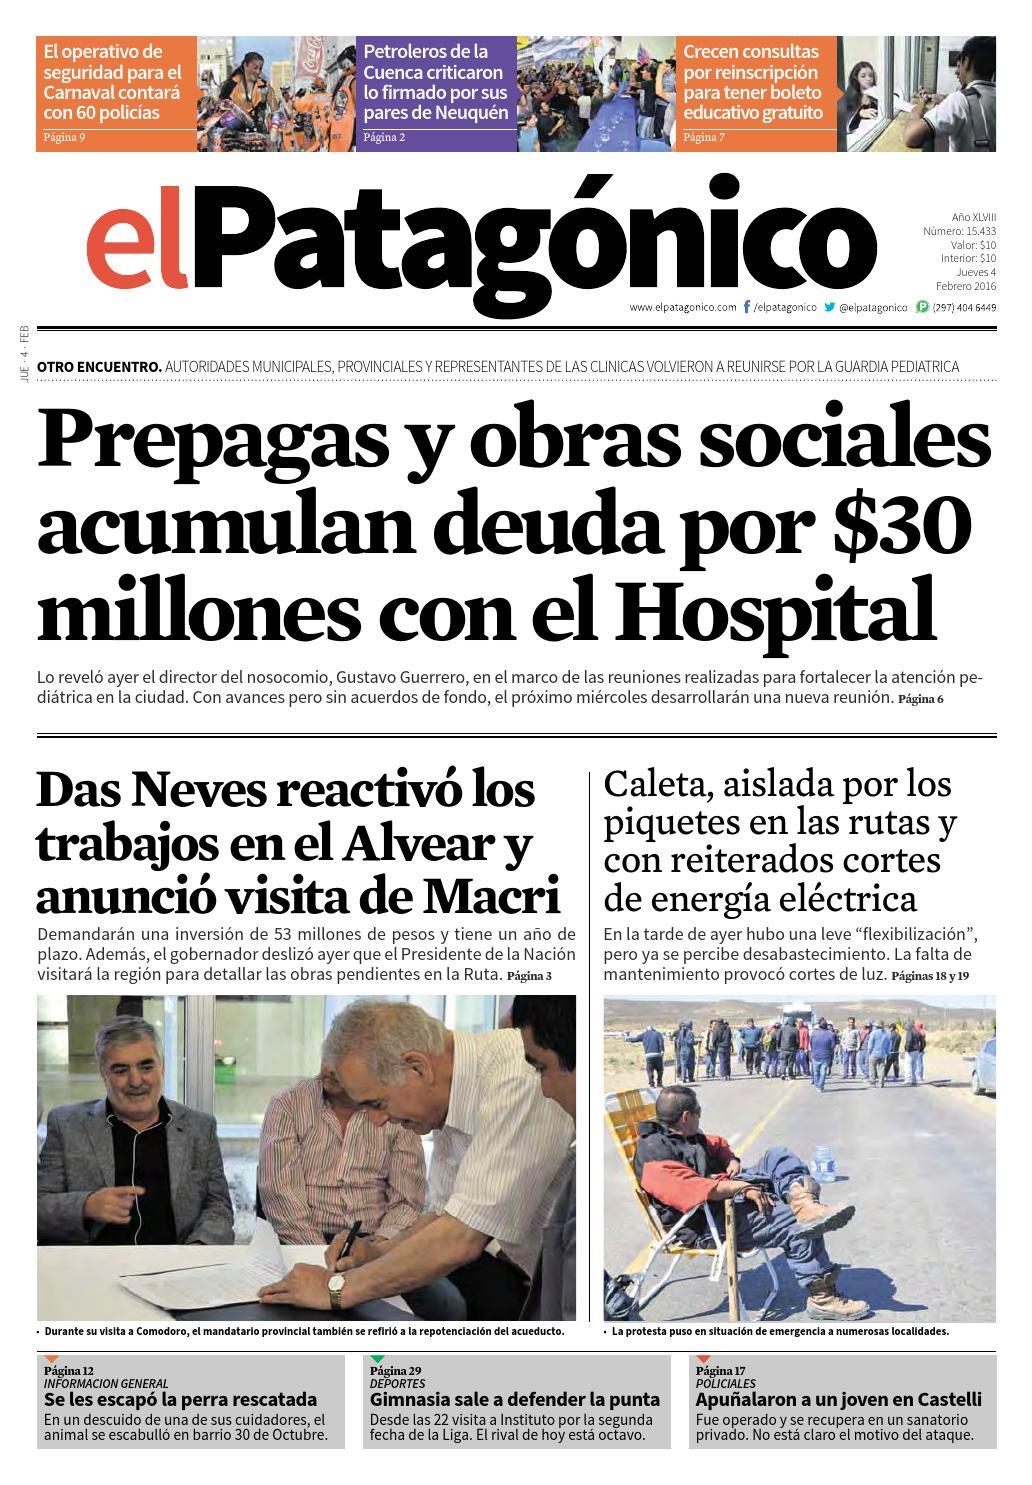 edicion232403022016.pdf by El Patagonico - issuu